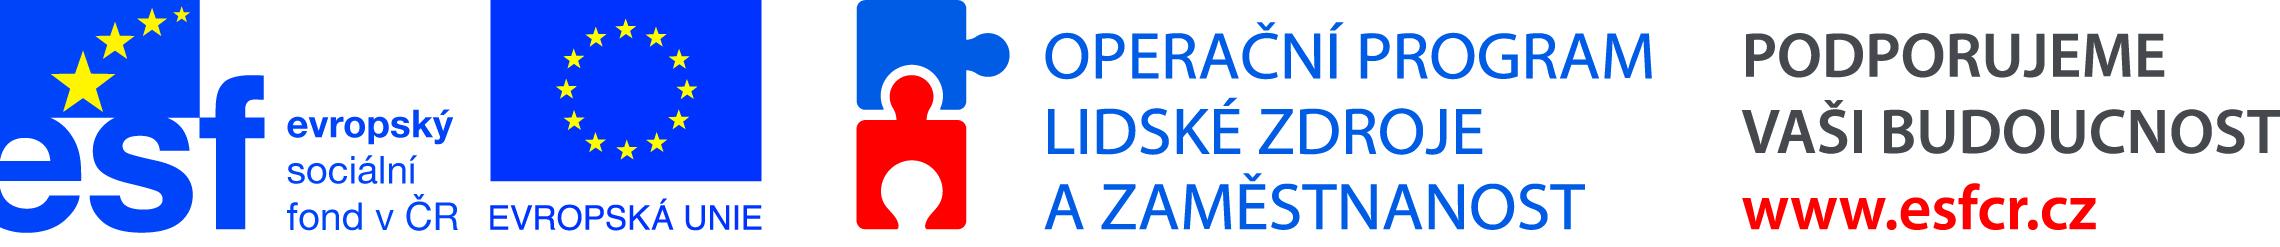 esf_eu_oplzz_podporujeme_horizontal_cmyk.jpg